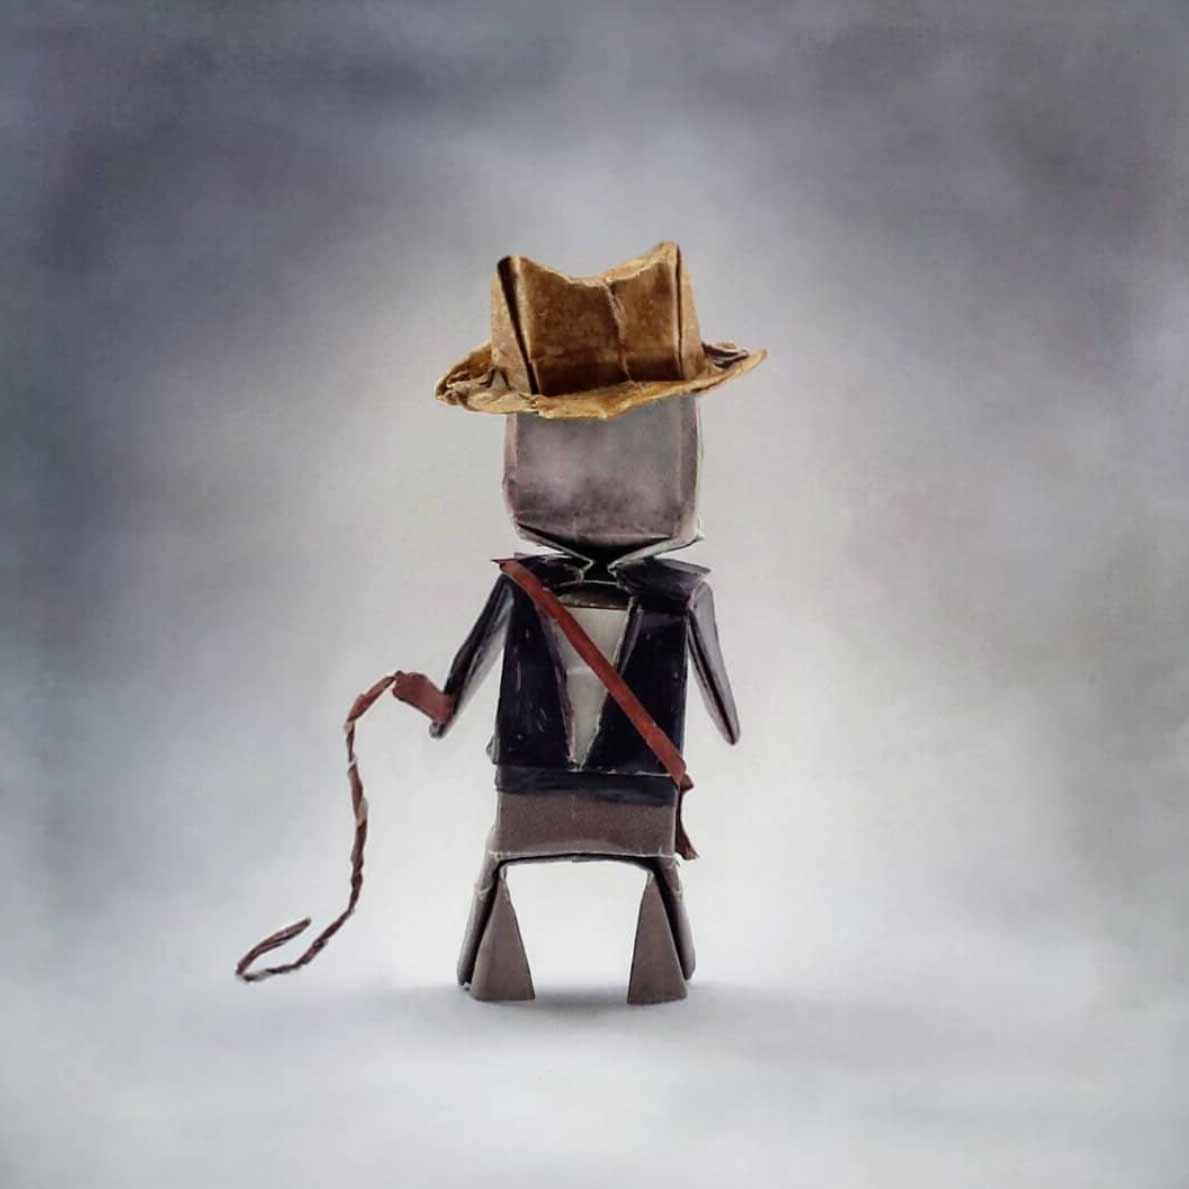 Popkultur-Origami-Figuren von Louise Cassidy origami-figuren-Louise-Cassidy_06